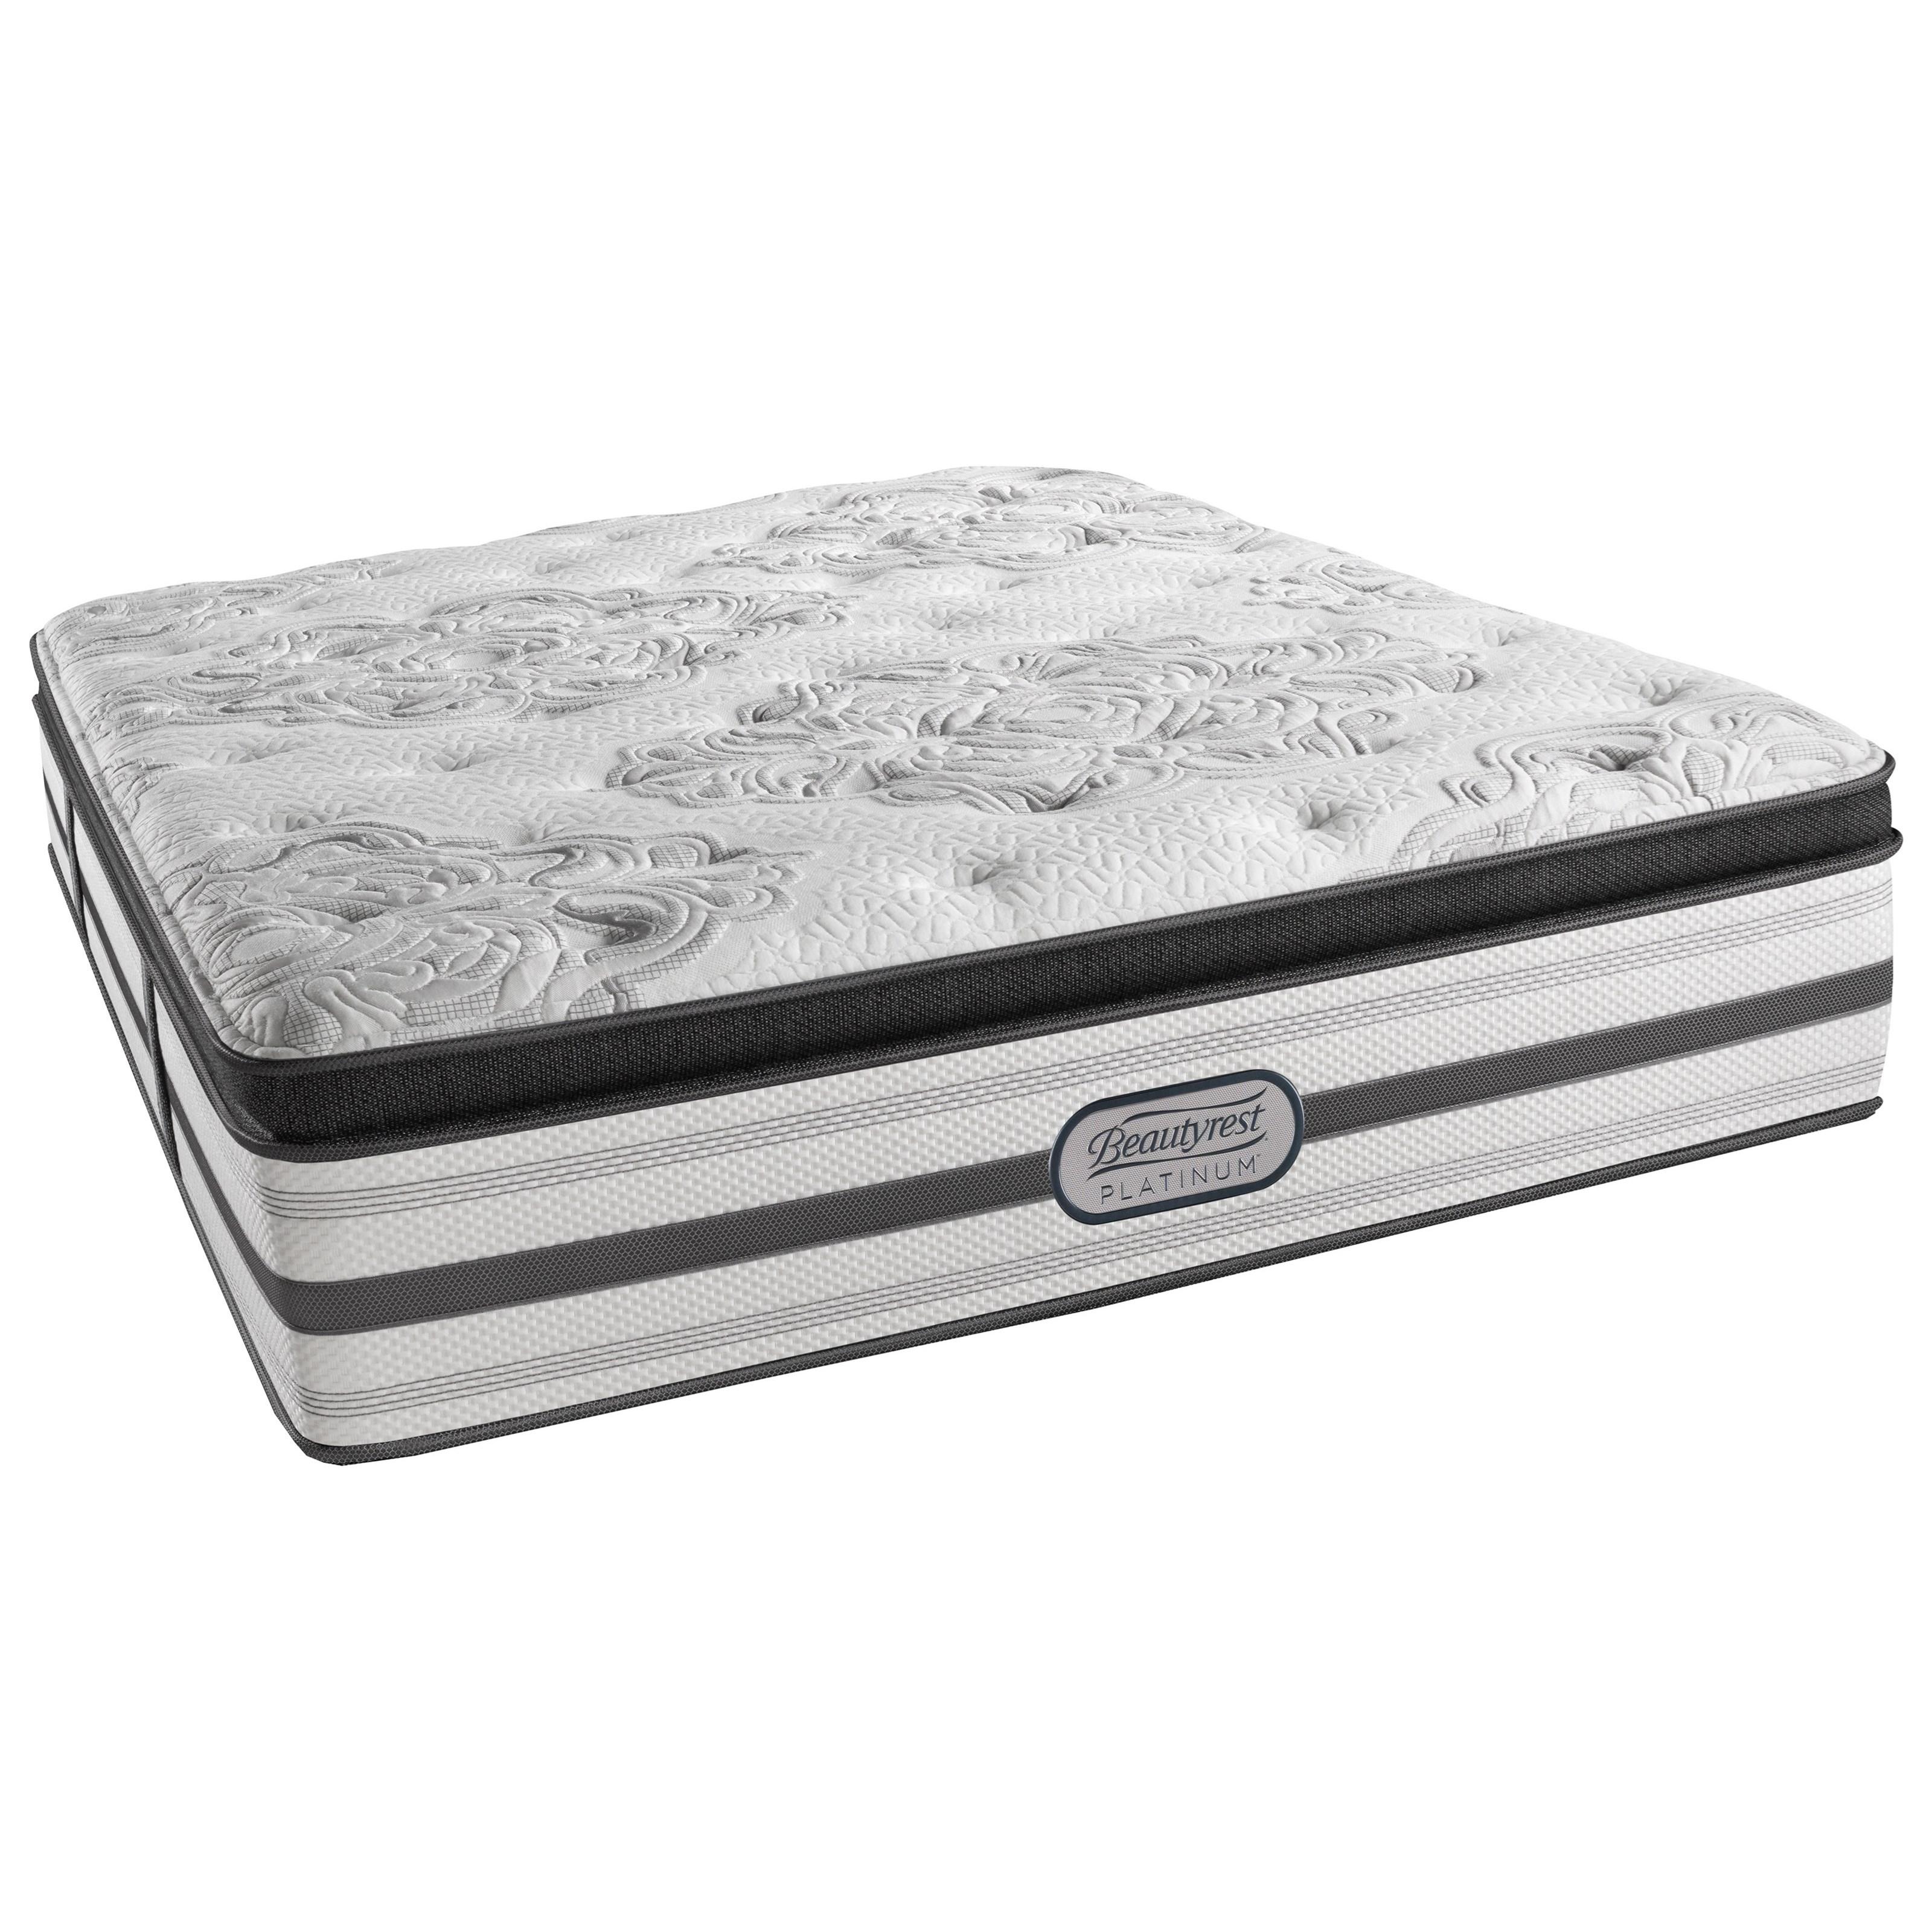 Beautyrest Platinum Gabriella Twin XL Lux Firm Pillow Top Adjustable Set - Item Number: LV3LFPT-TXL+SM3-TXL